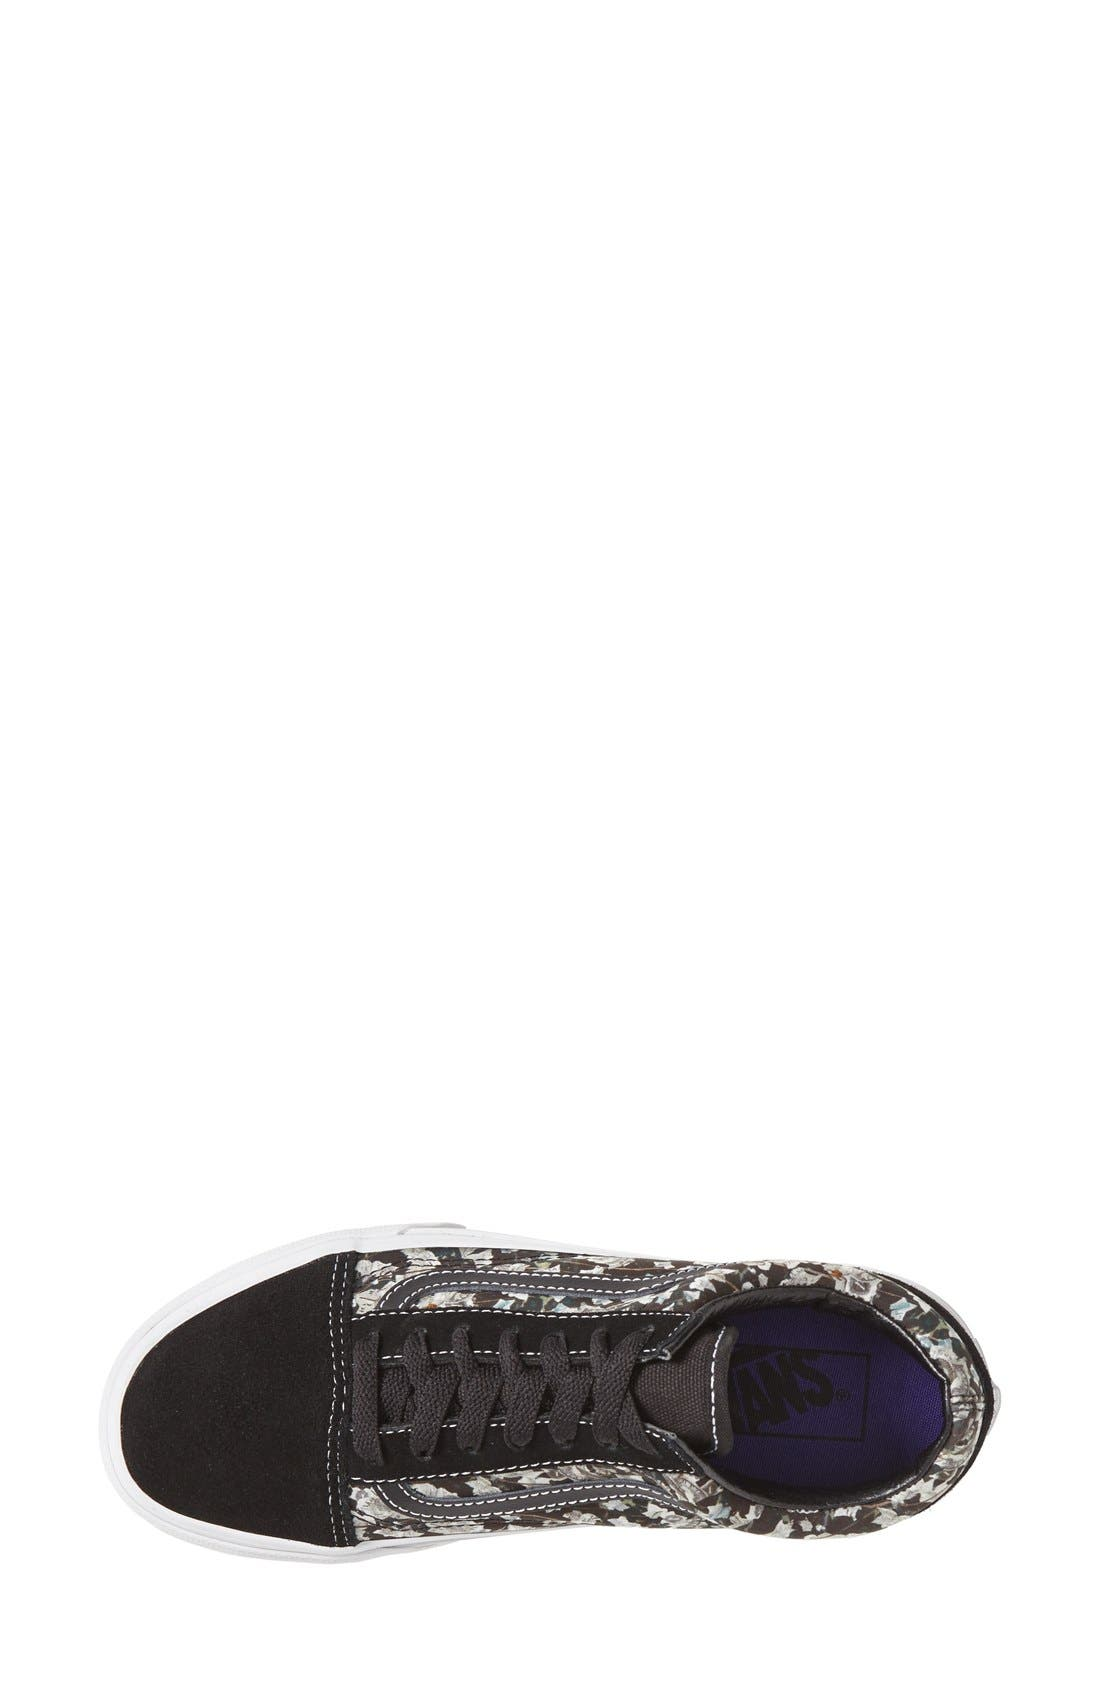 Alternate Image 3  - Vans 'Old Skool - Liberty Era' Sneaker (Women)